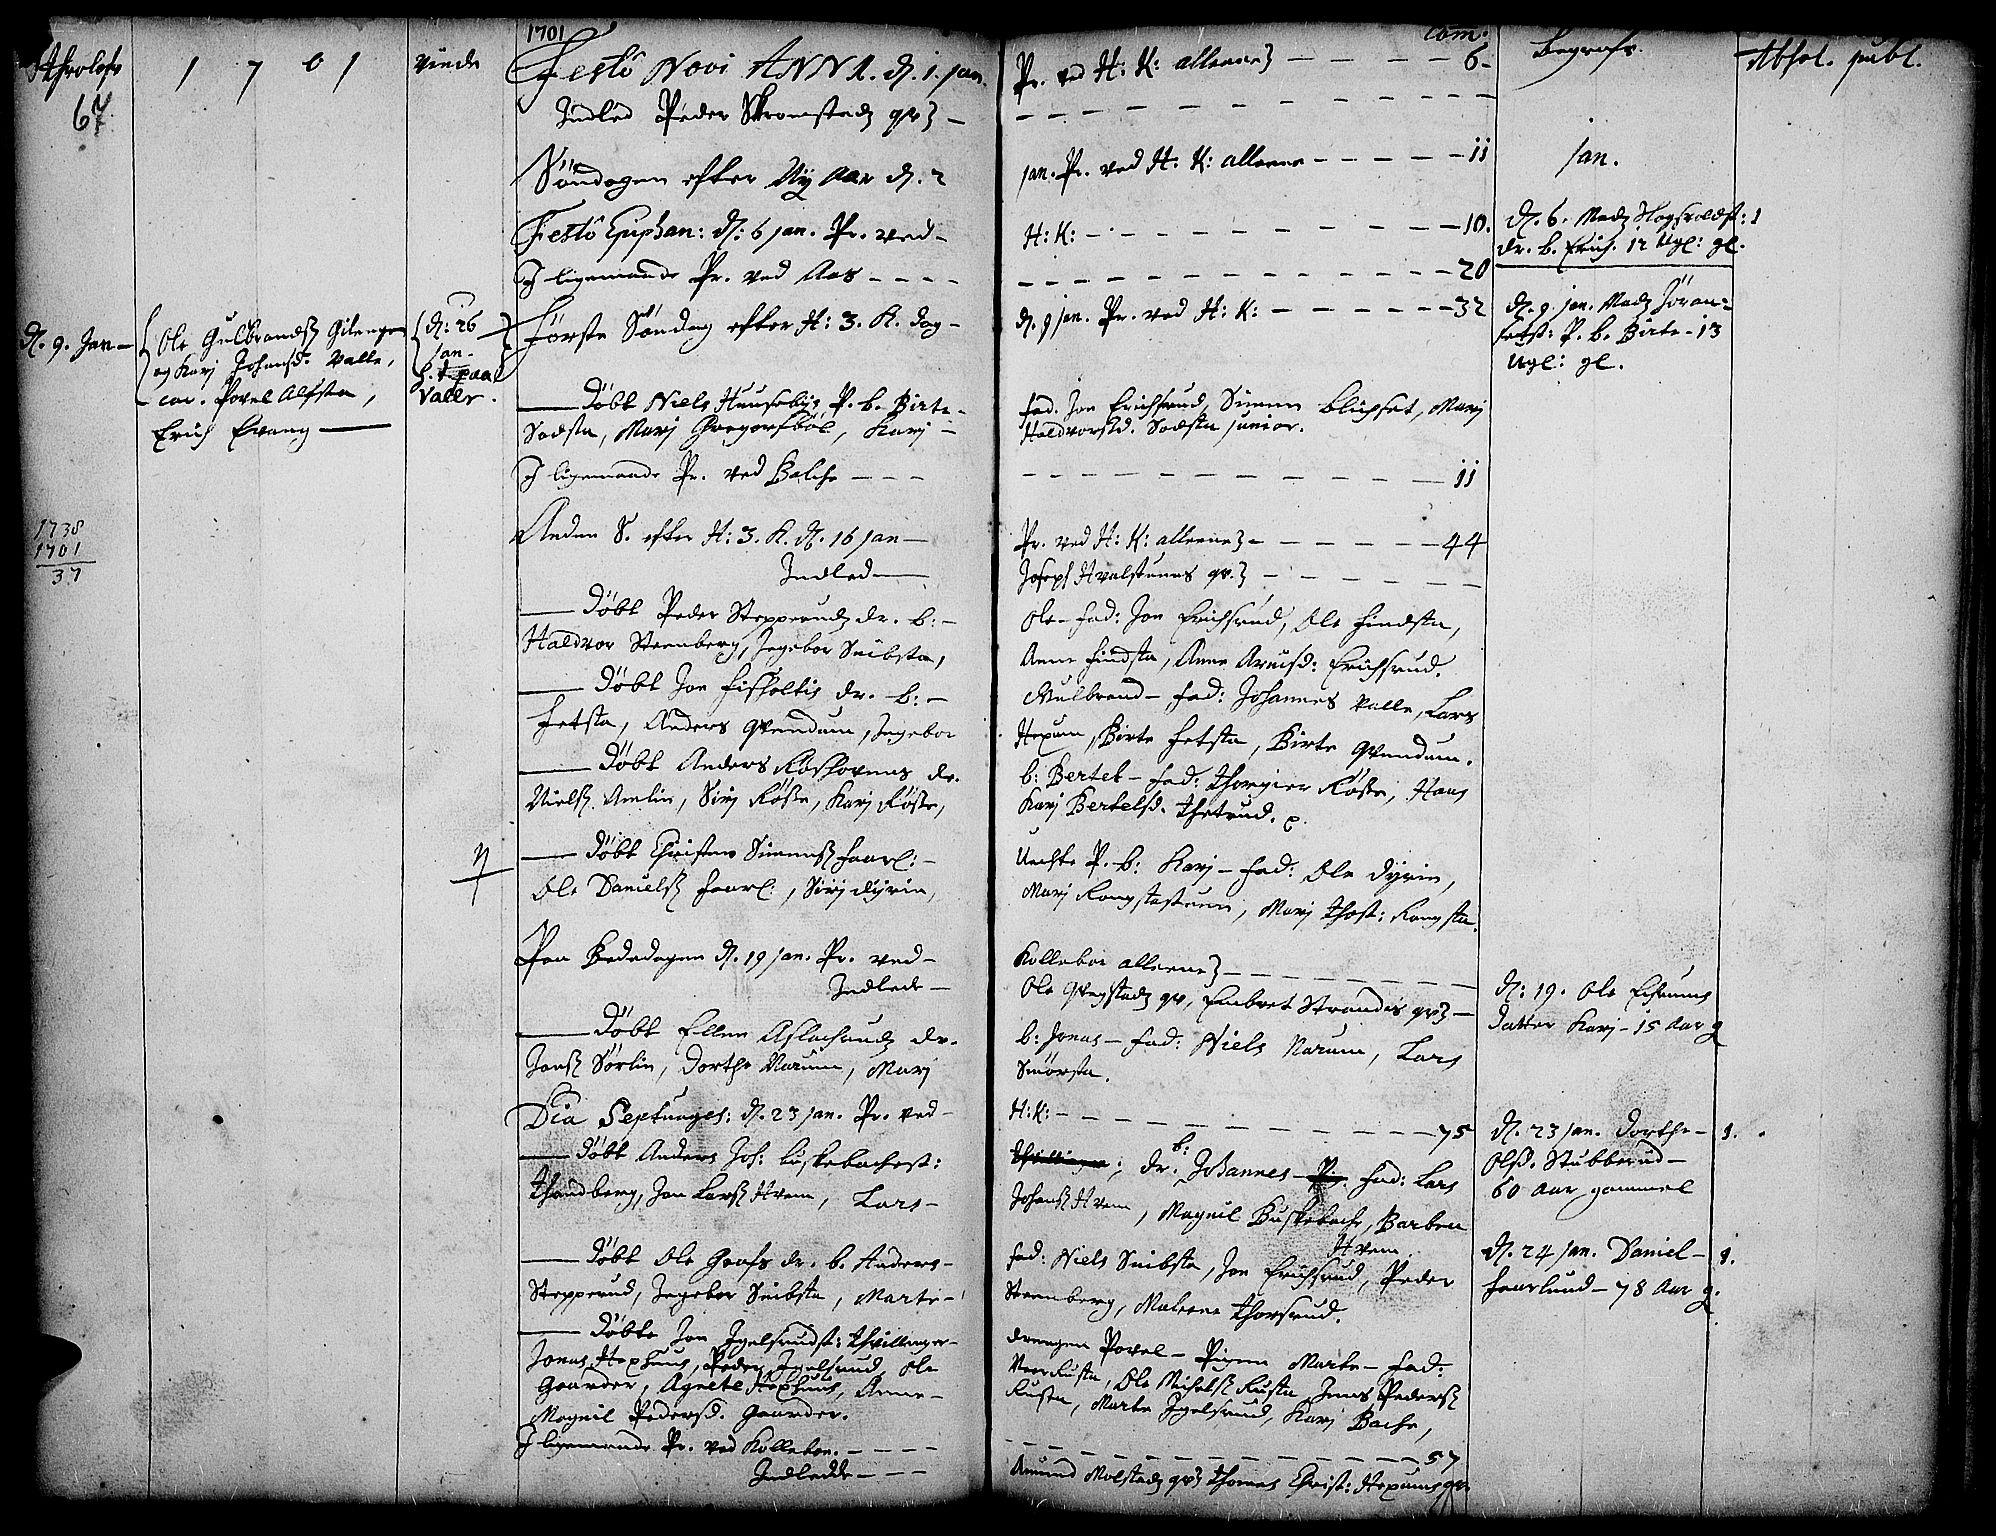 SAH, Toten prestekontor, Ministerialbok nr. 1, 1695-1713, s. 67